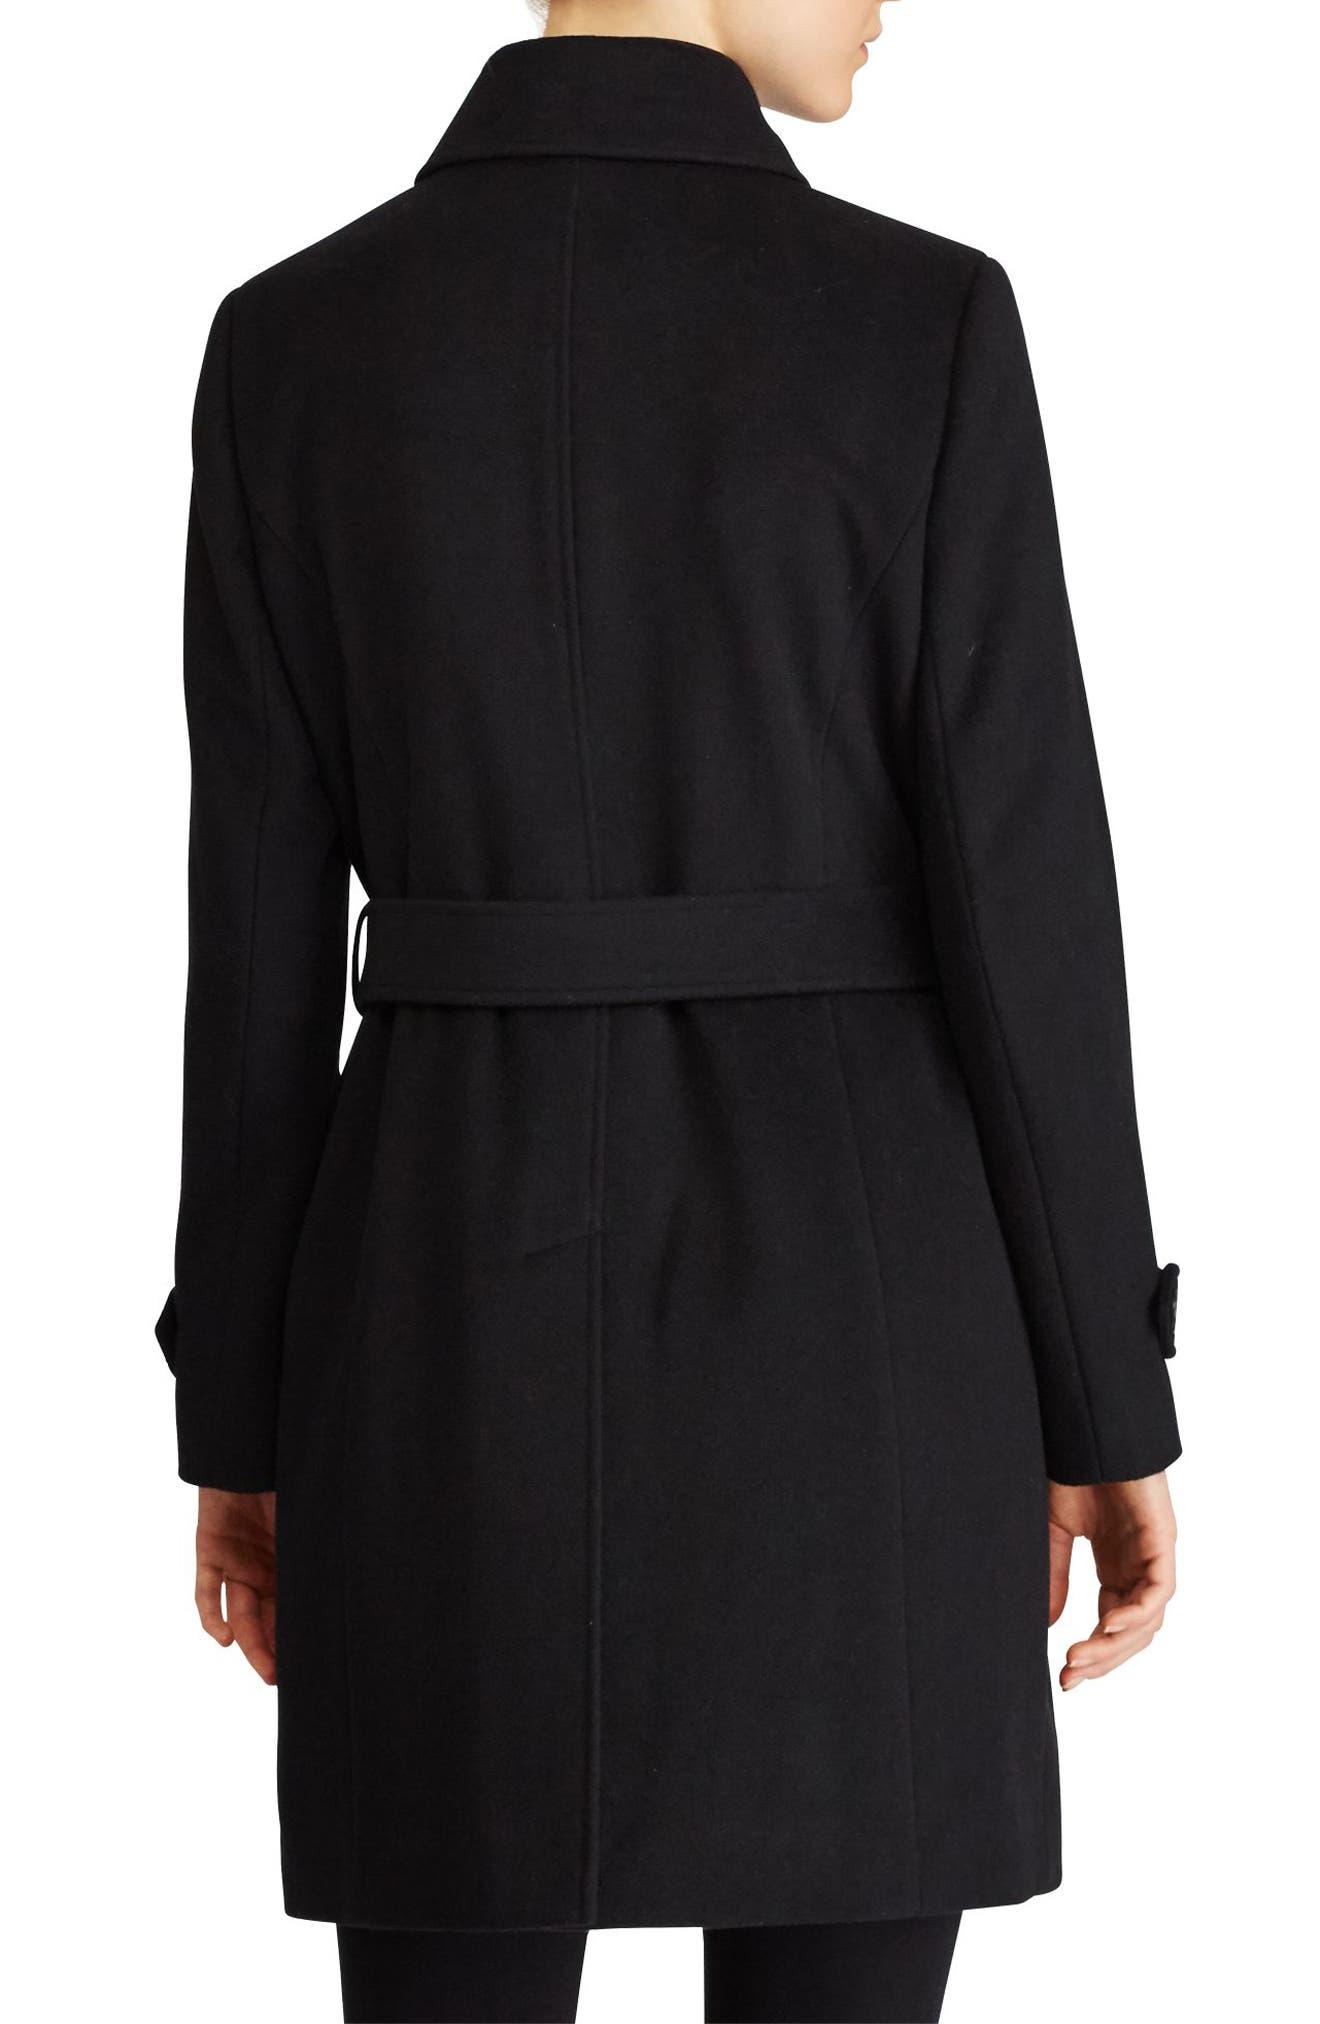 Wool Blend Trench Coat,                             Alternate thumbnail 3, color,                             Black